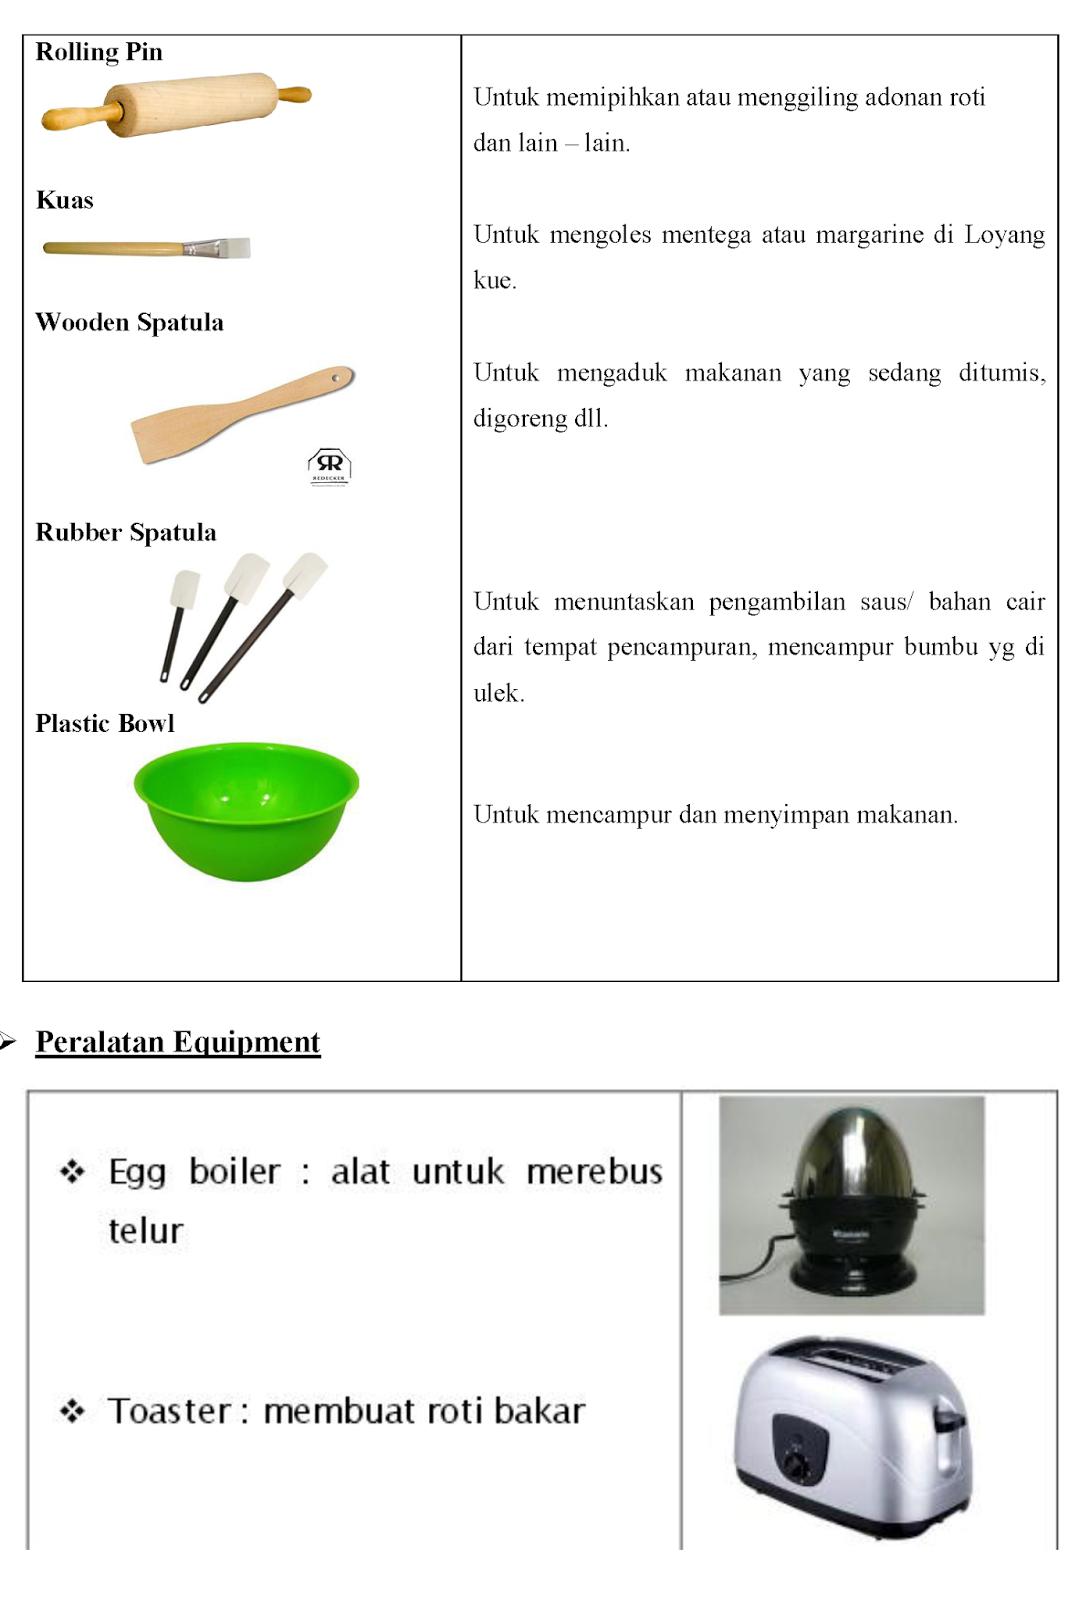 Jenis Peralatan Fungsi Peralatan Pengolahan Makanan Membuat